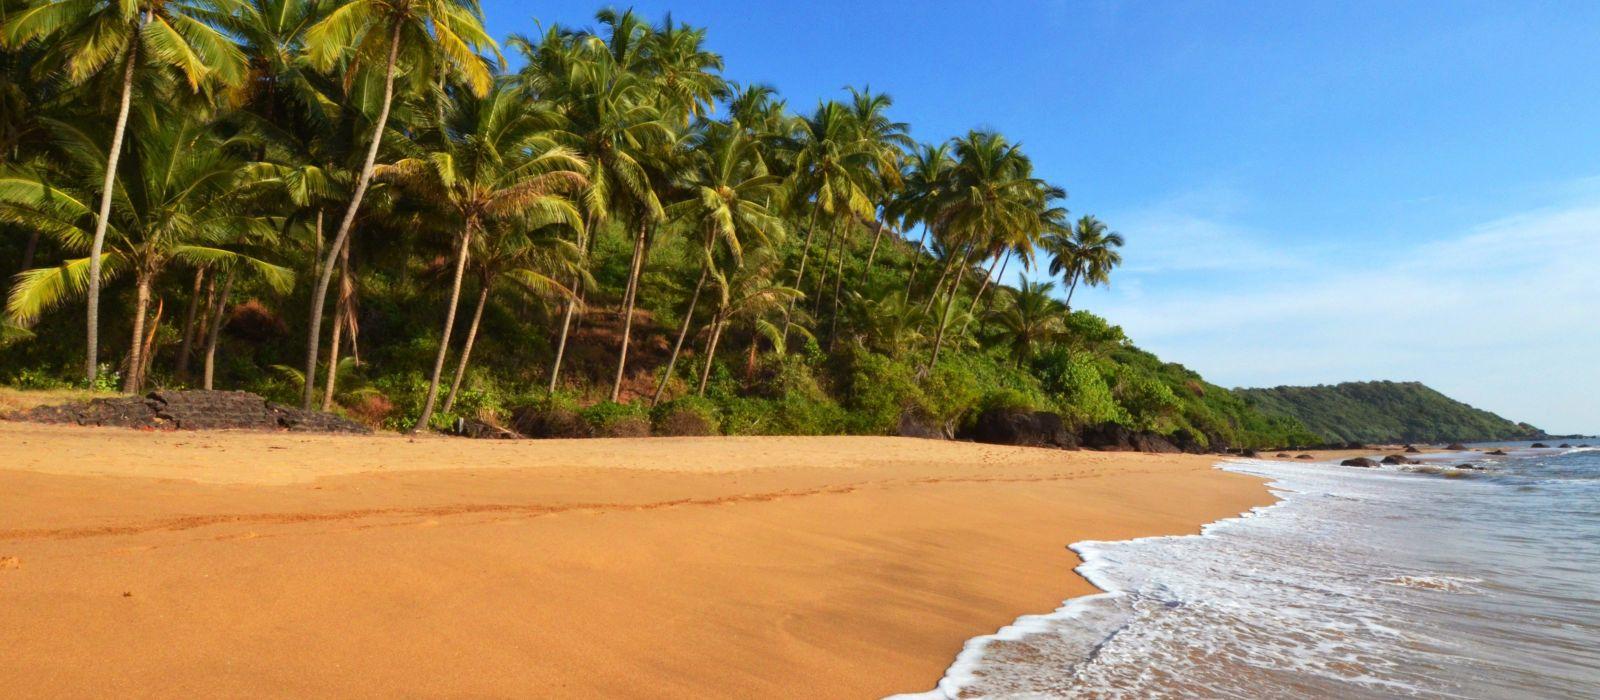 Beach, Goa, India, Asia